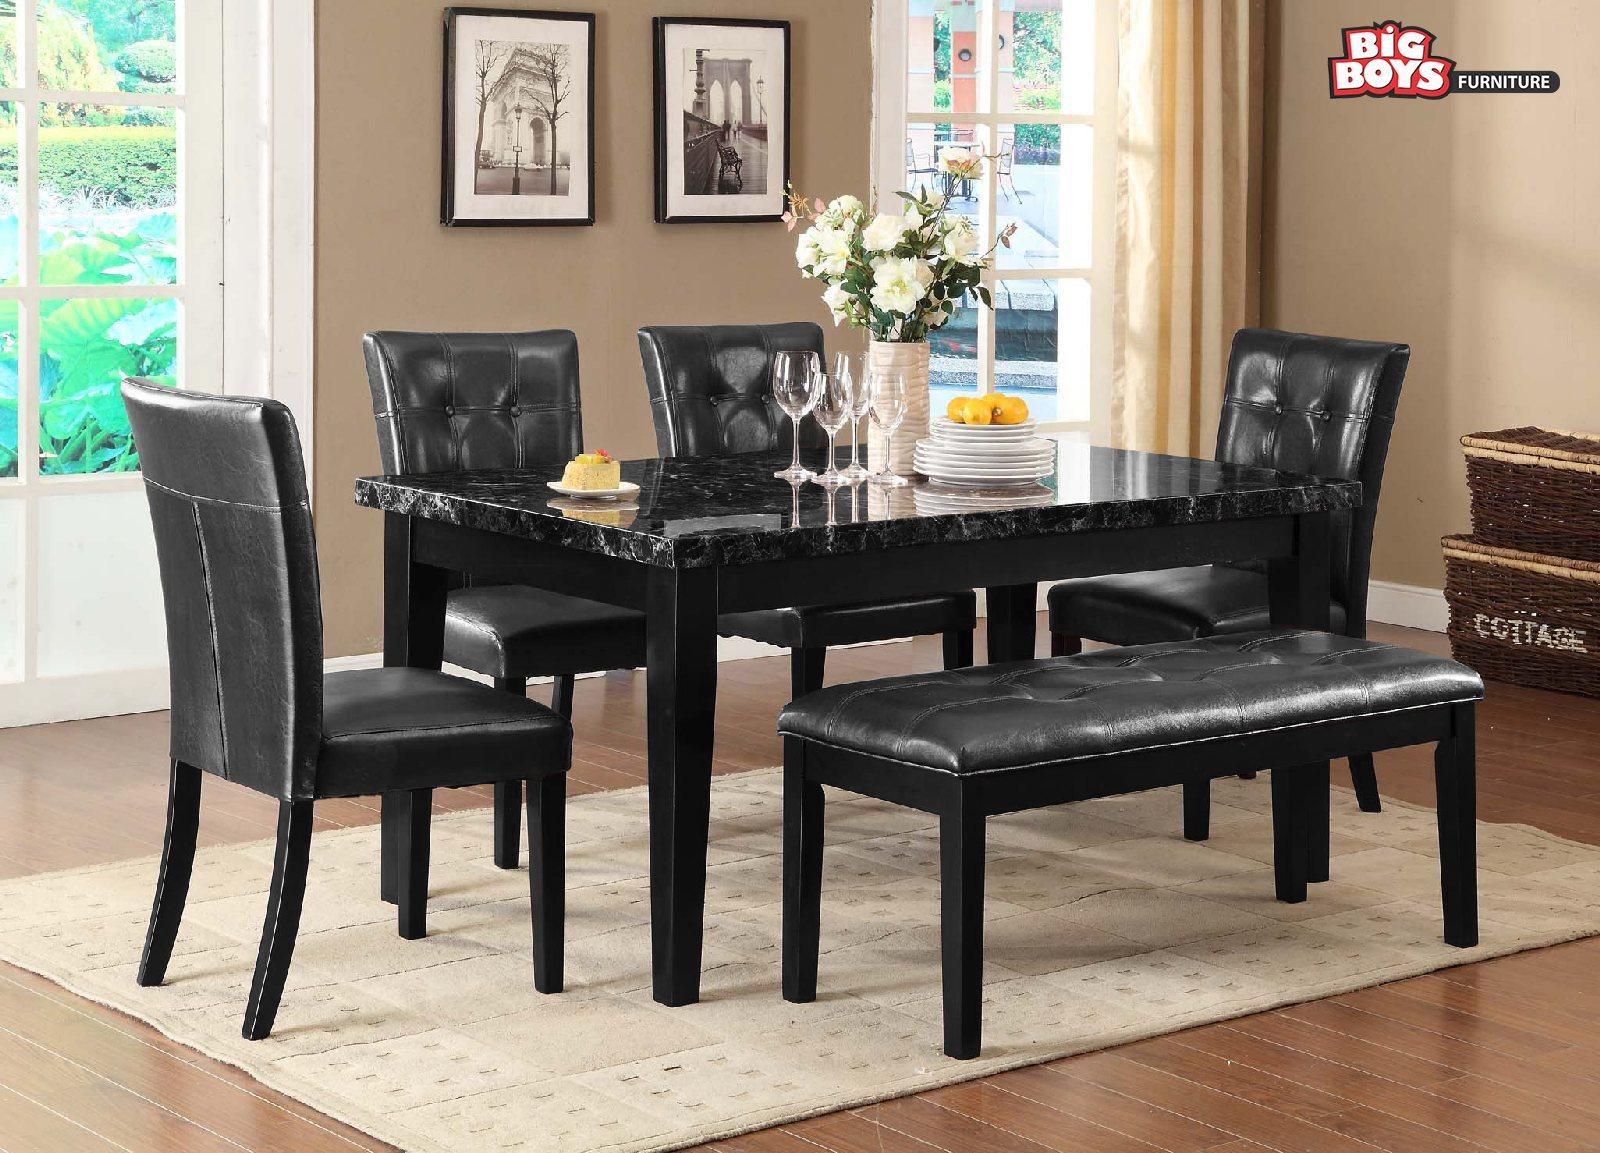 Unique combination of furniture at best prices